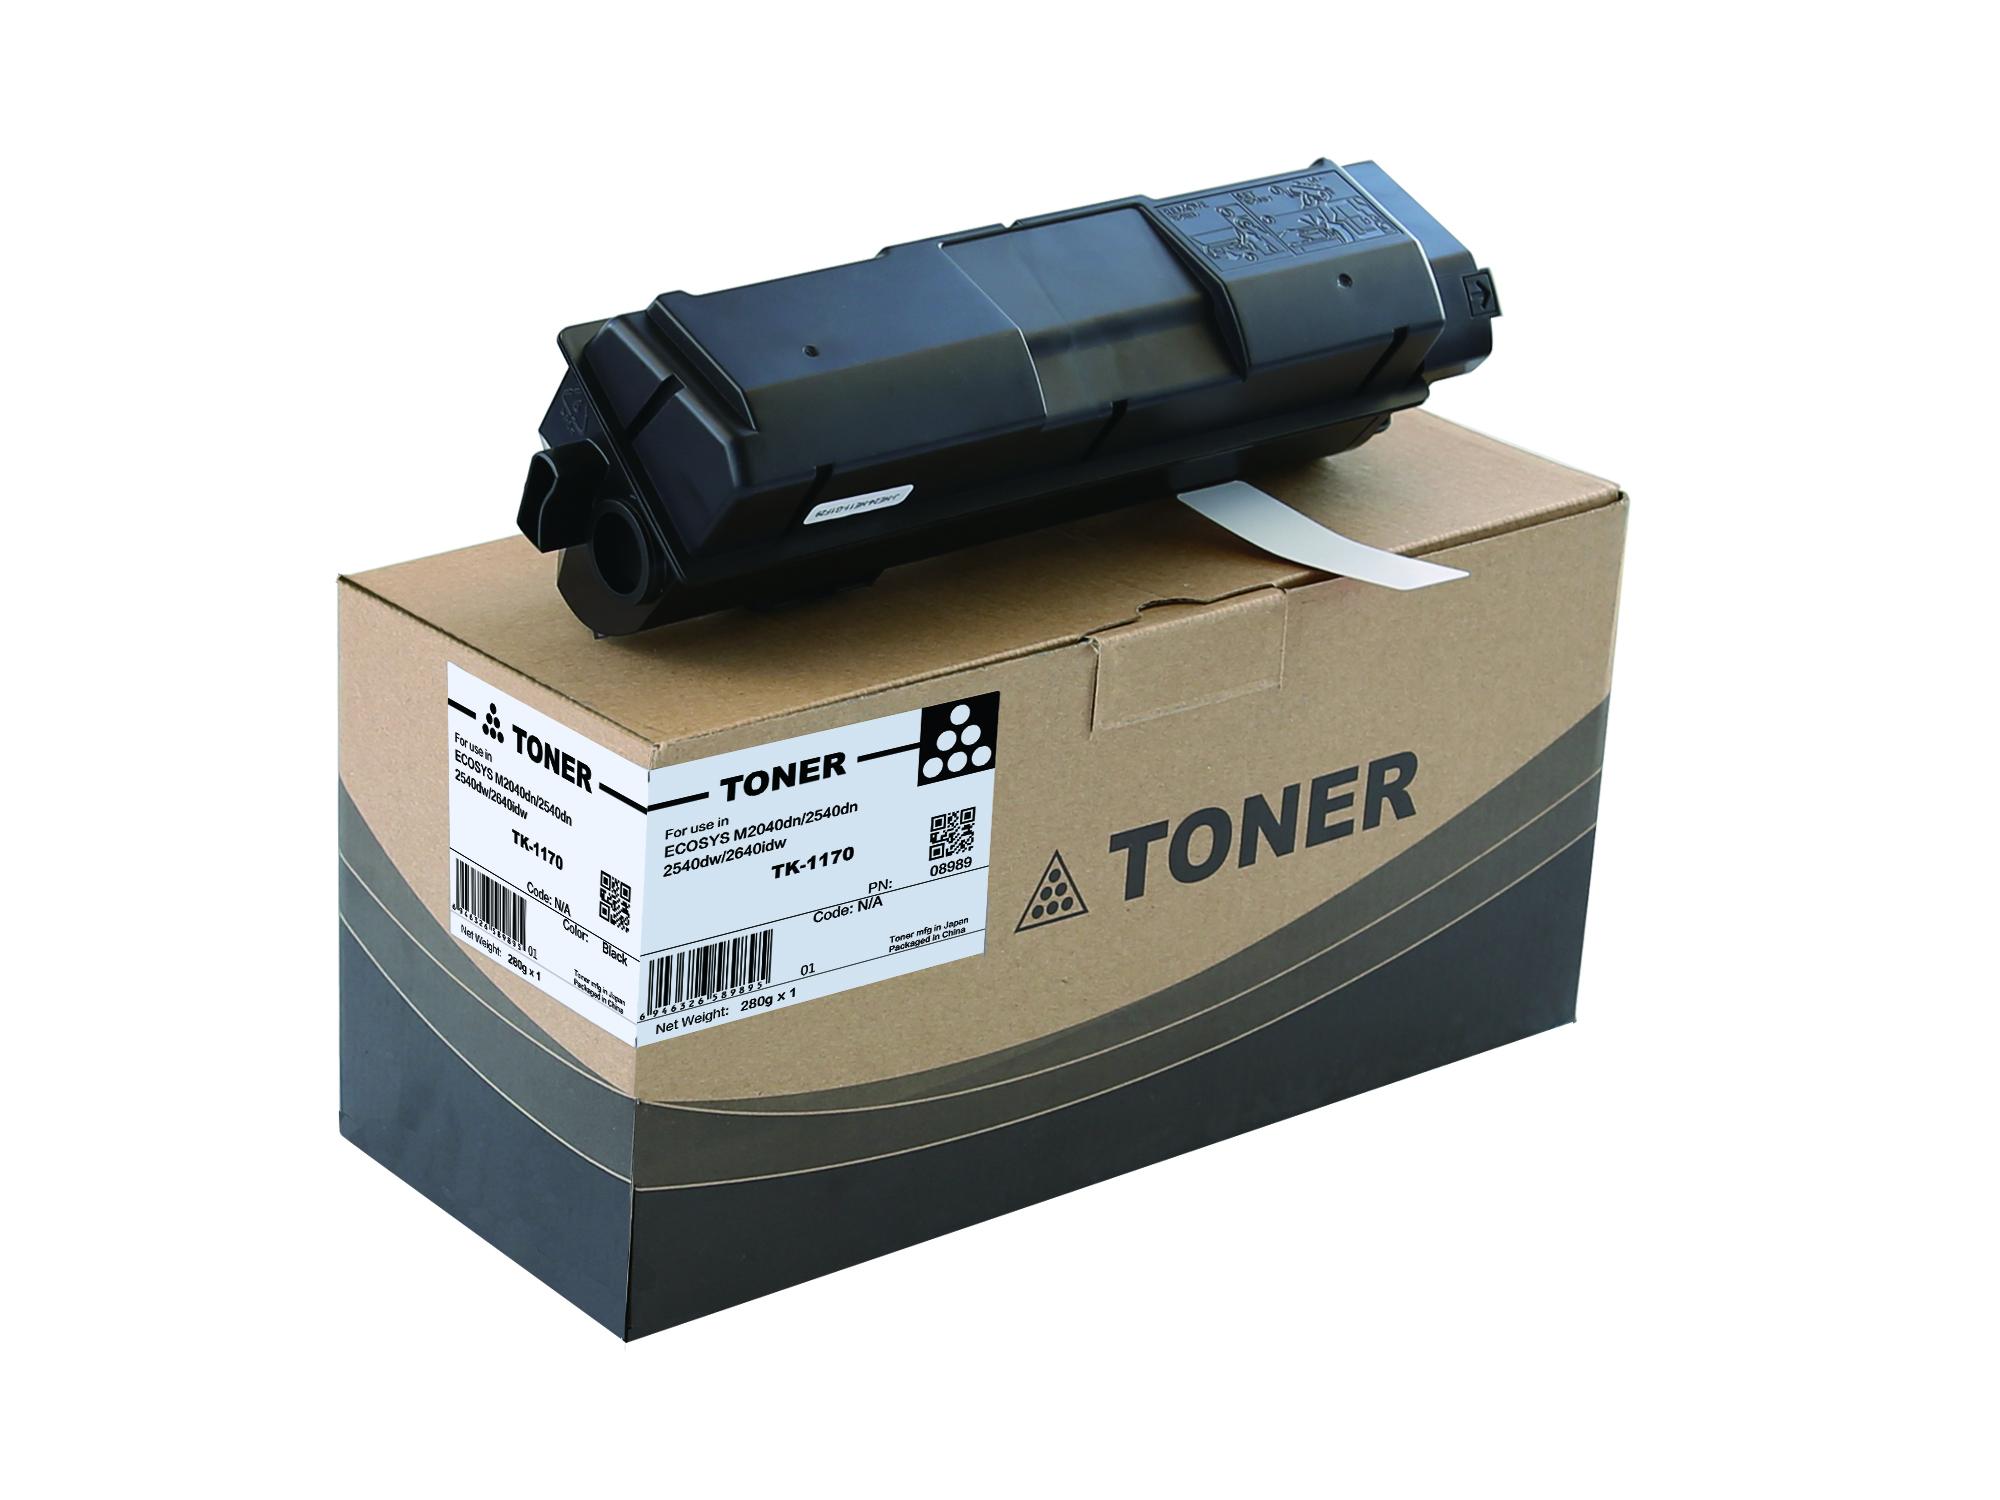 TK-1170 Toner Cartridge for Kyocera ECOSYS M2040dn